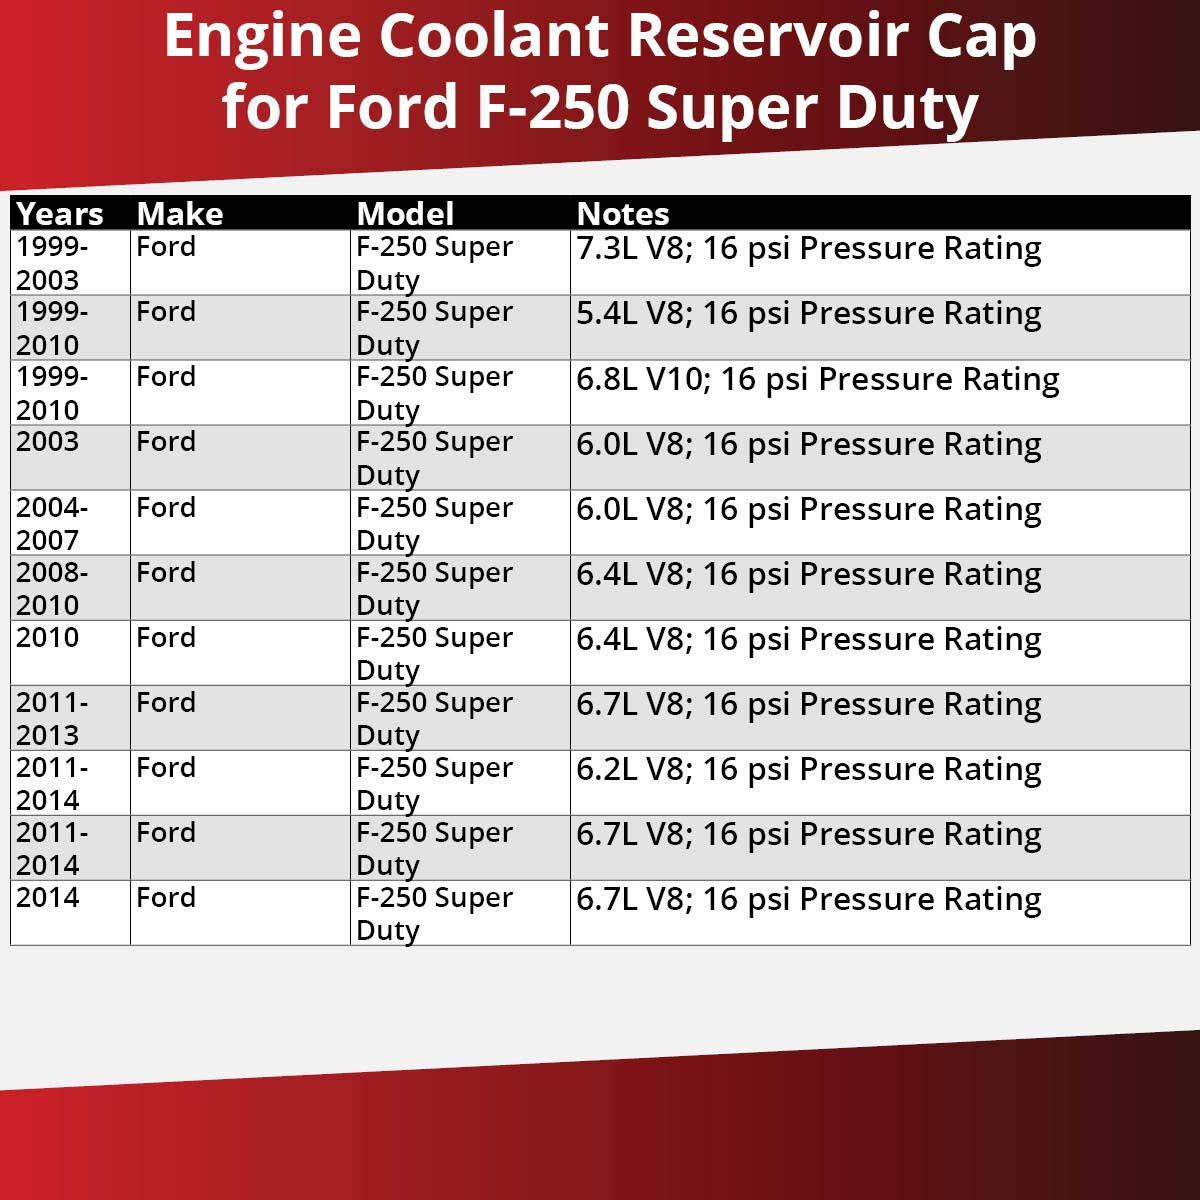 Antifreeze Coolant Engine Radiator Pump Gates Coolant Reservoir Cap for 1999-2014 Ford F-250 Super Duty 6.8L V10 5.4L 7.3L 6.4L 6.0L 6.2L 6.7L V8